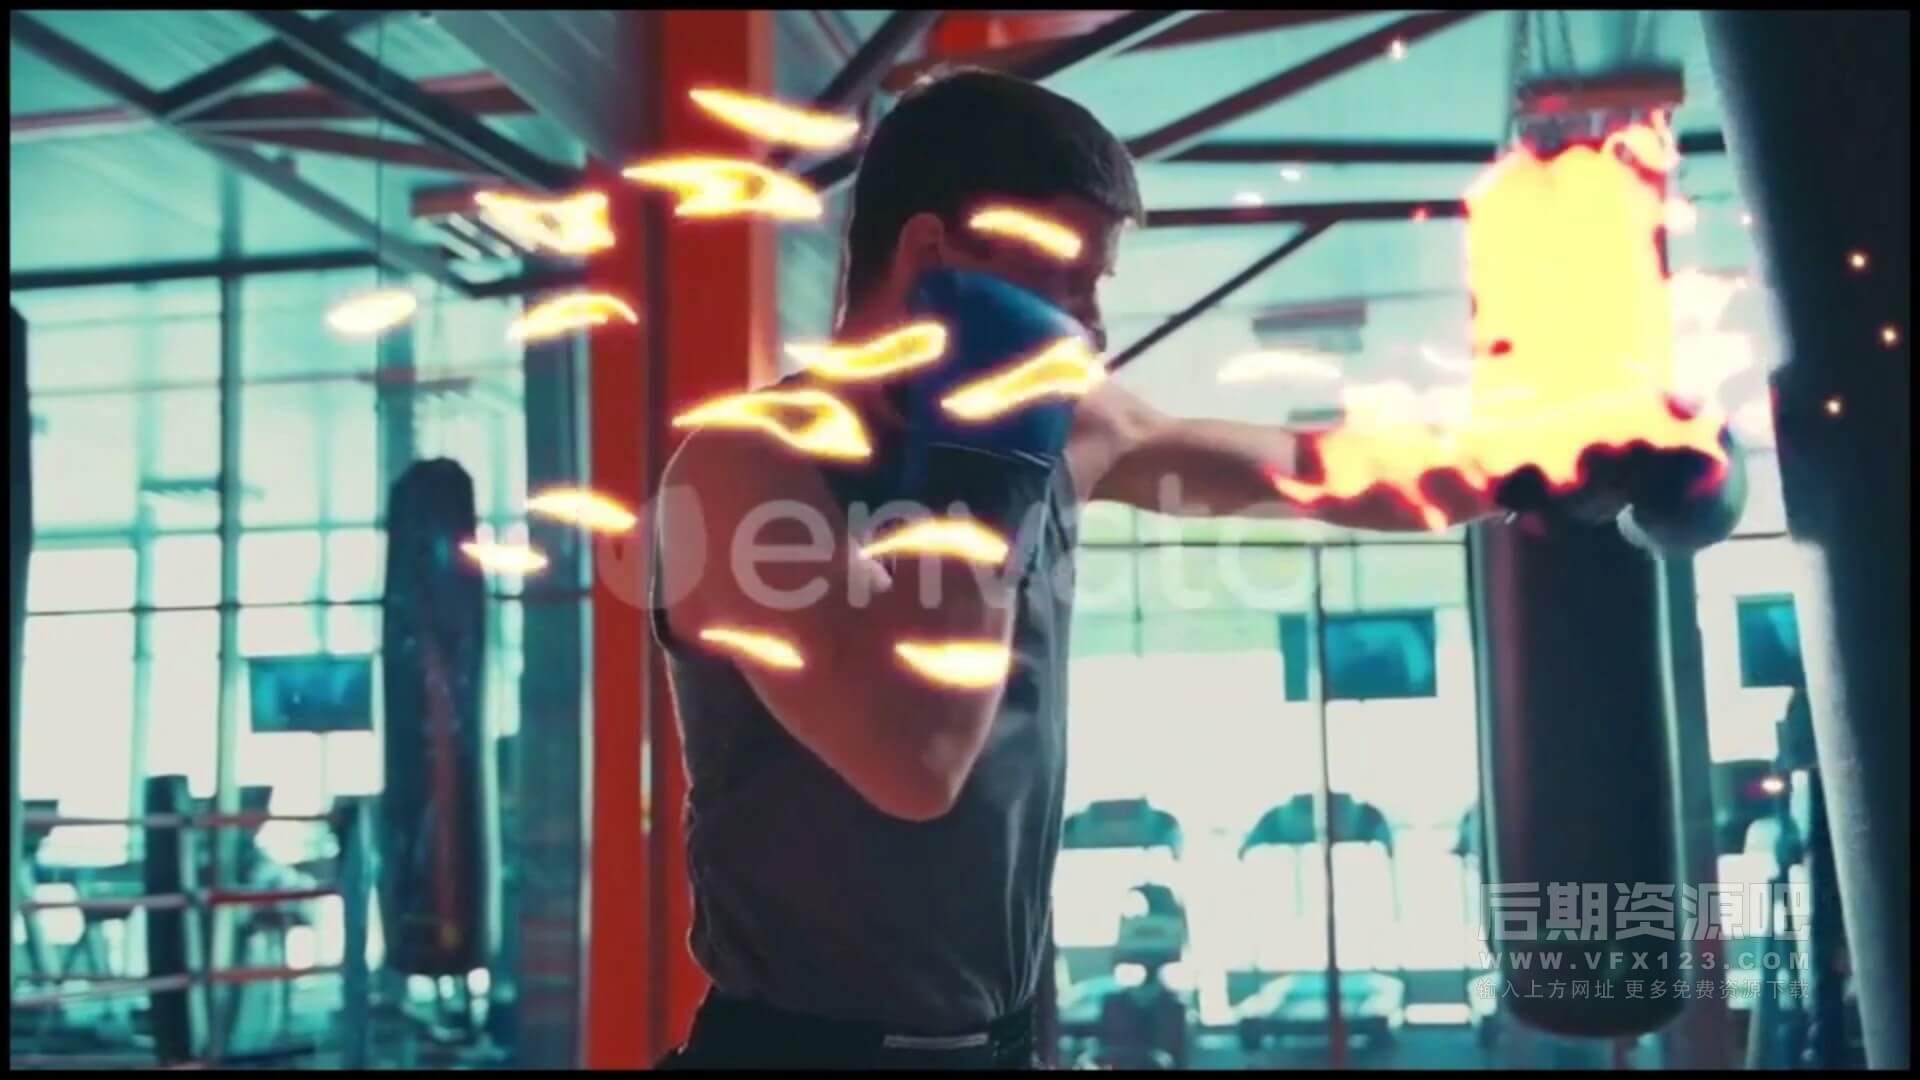 AE插件+脚本 300+发光涂鸦线条描边霓虹图形动画元素 Glowing Scribble Neon Fx